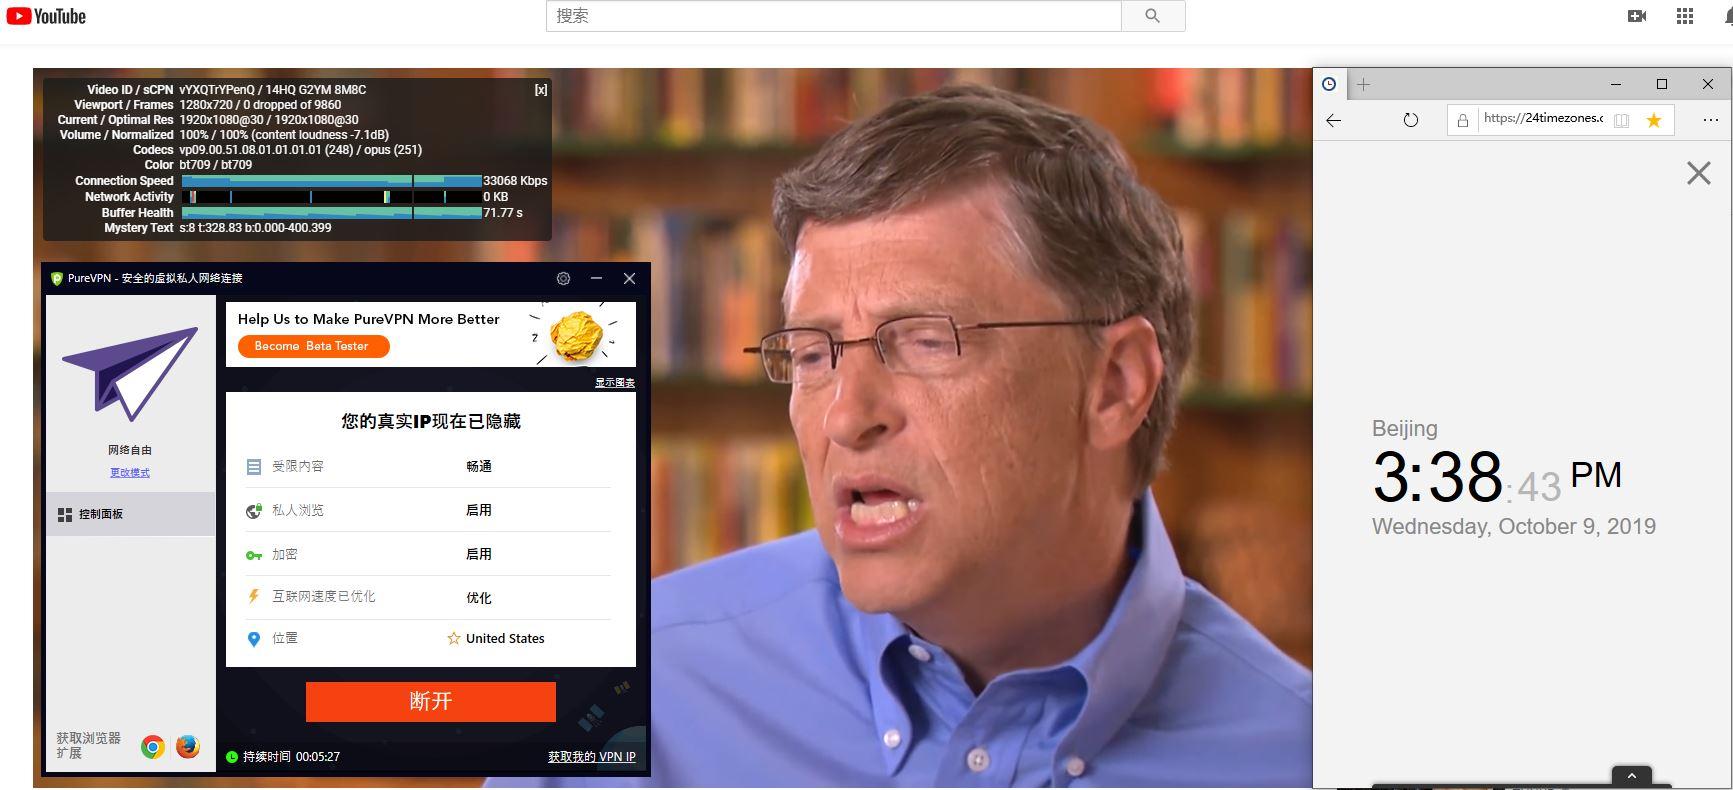 Windows PureVPN United States 中国VPN翻墙 科学上网 YouTube速测-20191009